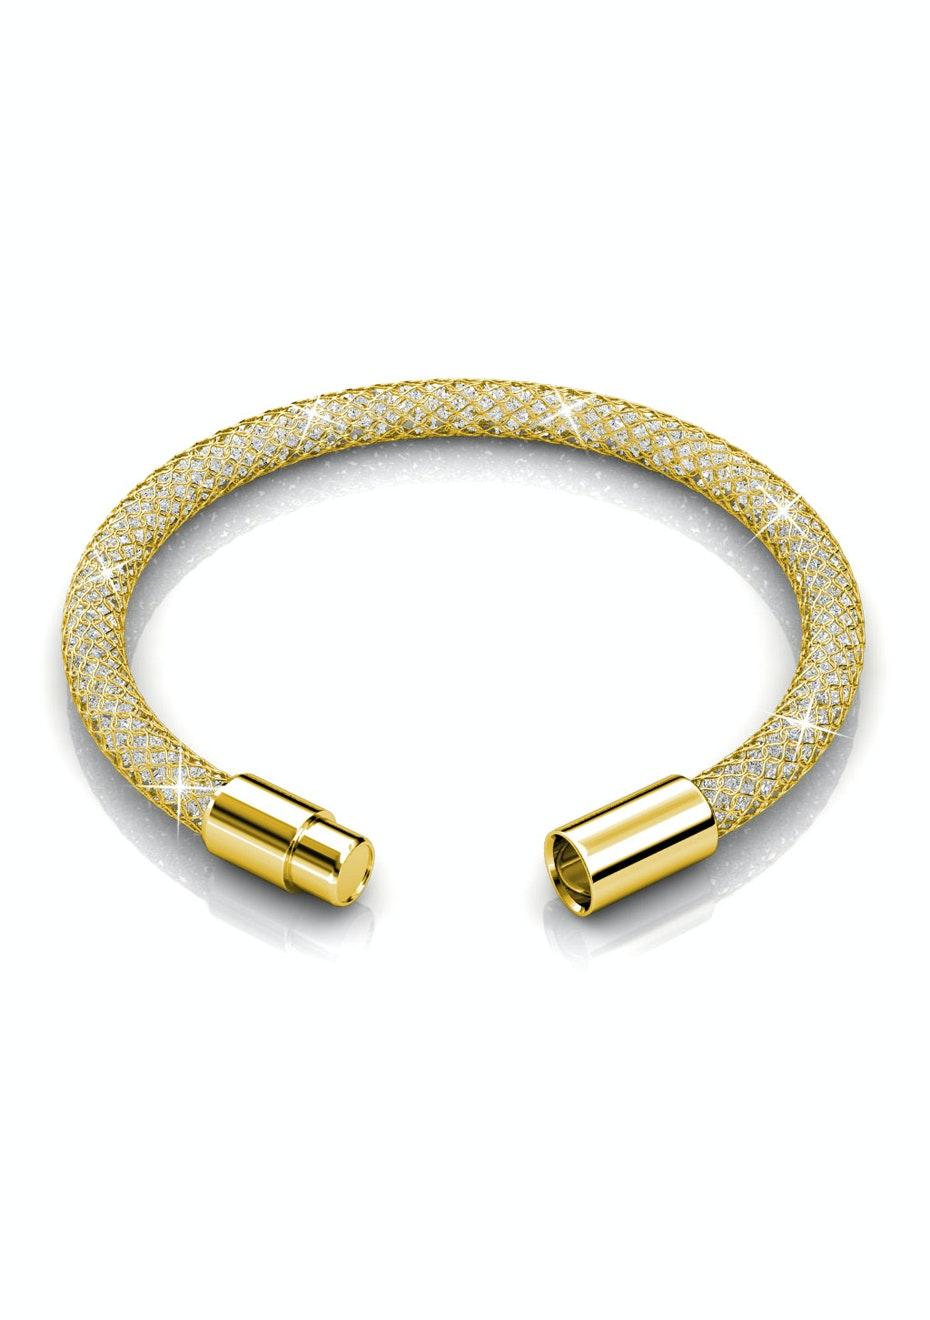 Mesh Single Wrap Bracelet Ft Swarovski Elements-Gld